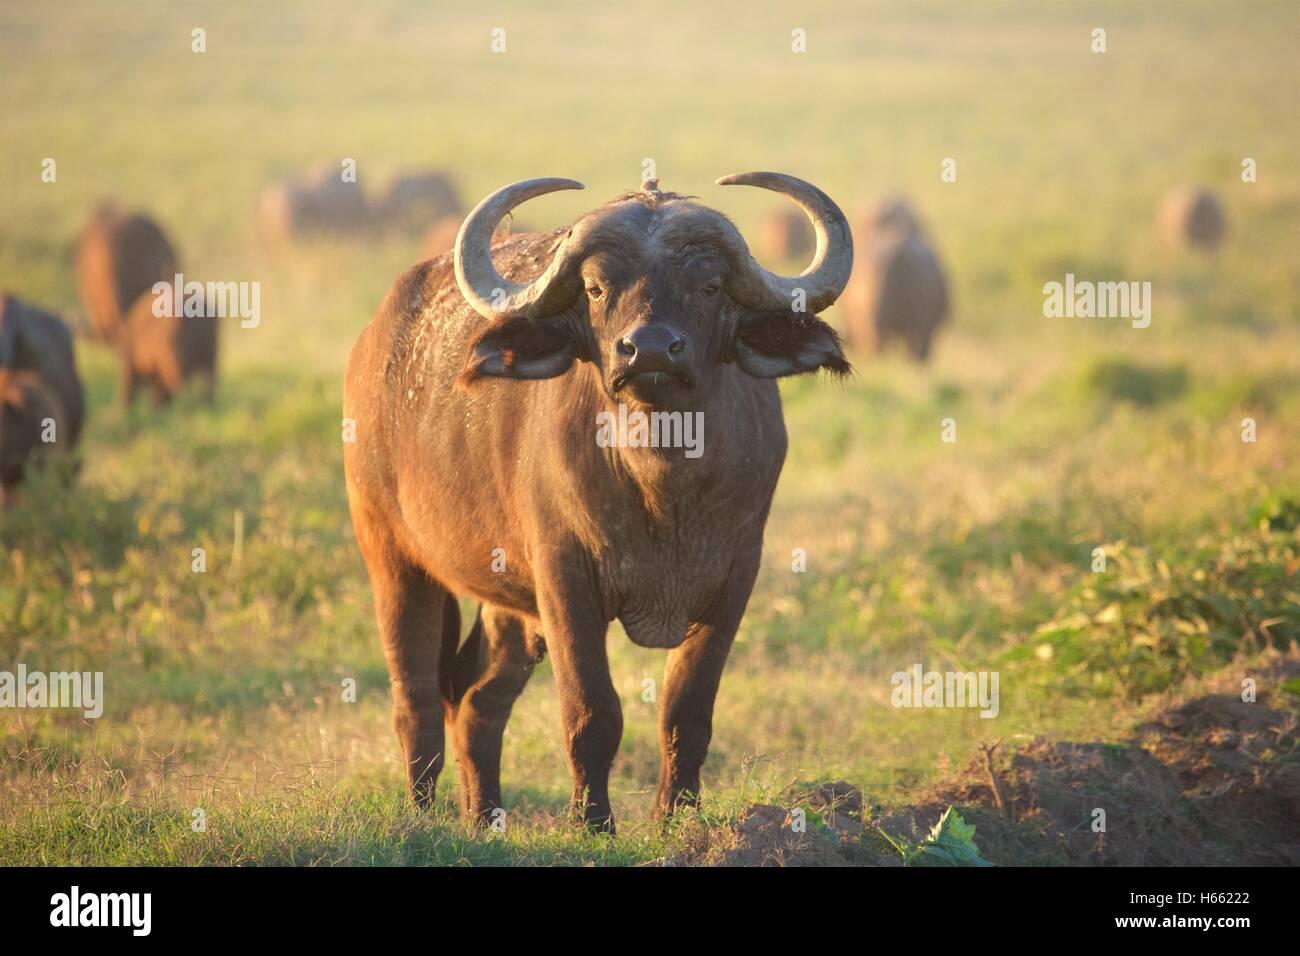 Viewing wild buffalo at sunrise at Lake Nakuru National Park, Kenya - Stock Image